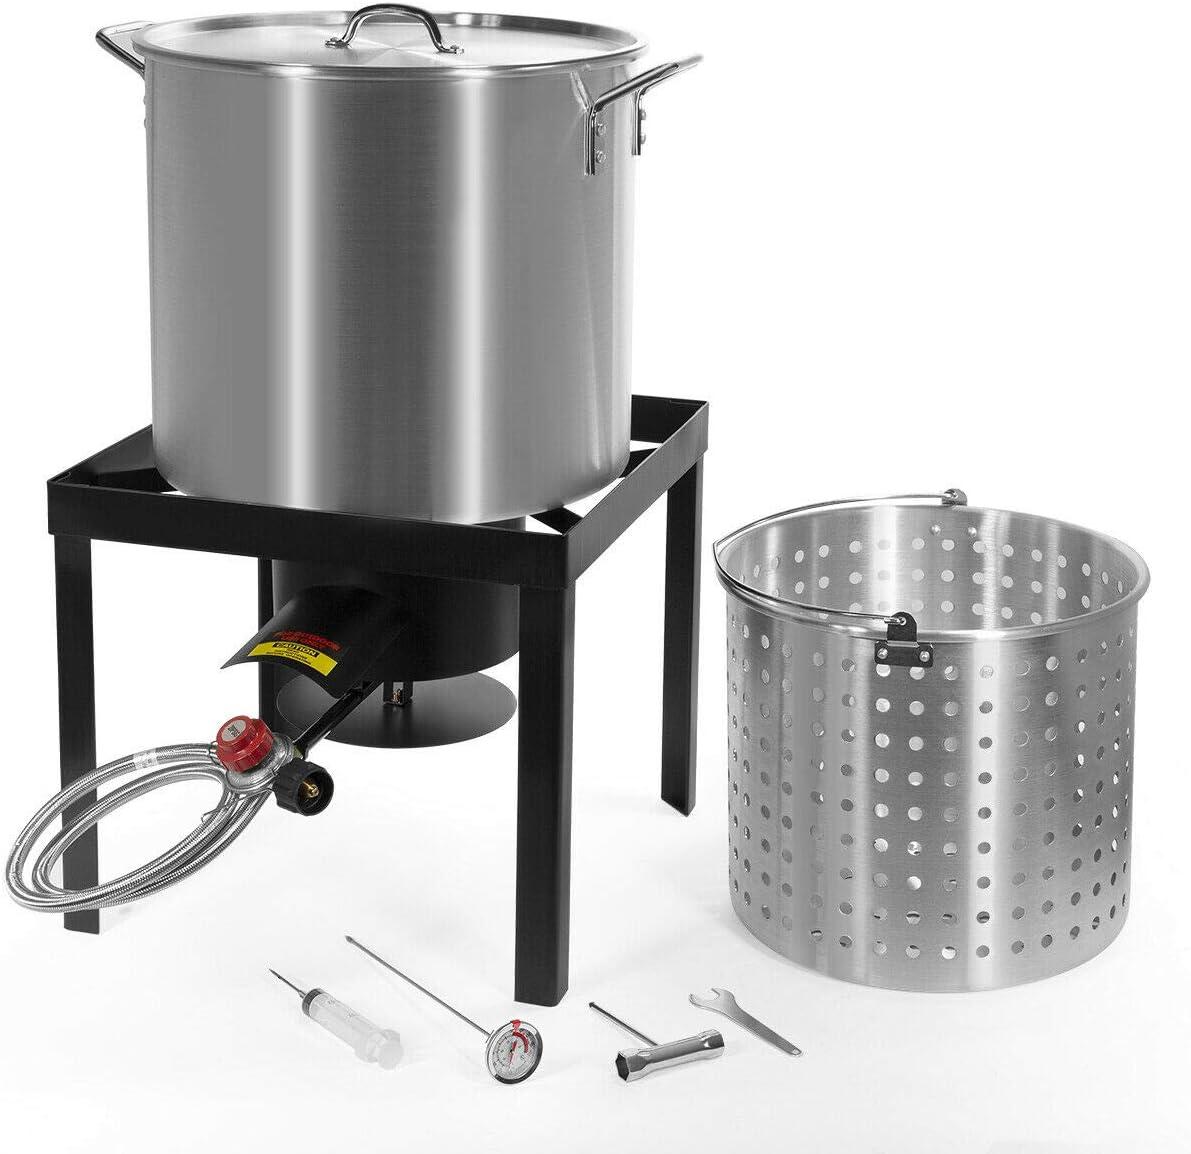 9TRADING X-Large 64 Qt Aluminum Turkey Deep Fryer Kit Stock Pot Propane LP Outdoor Burner